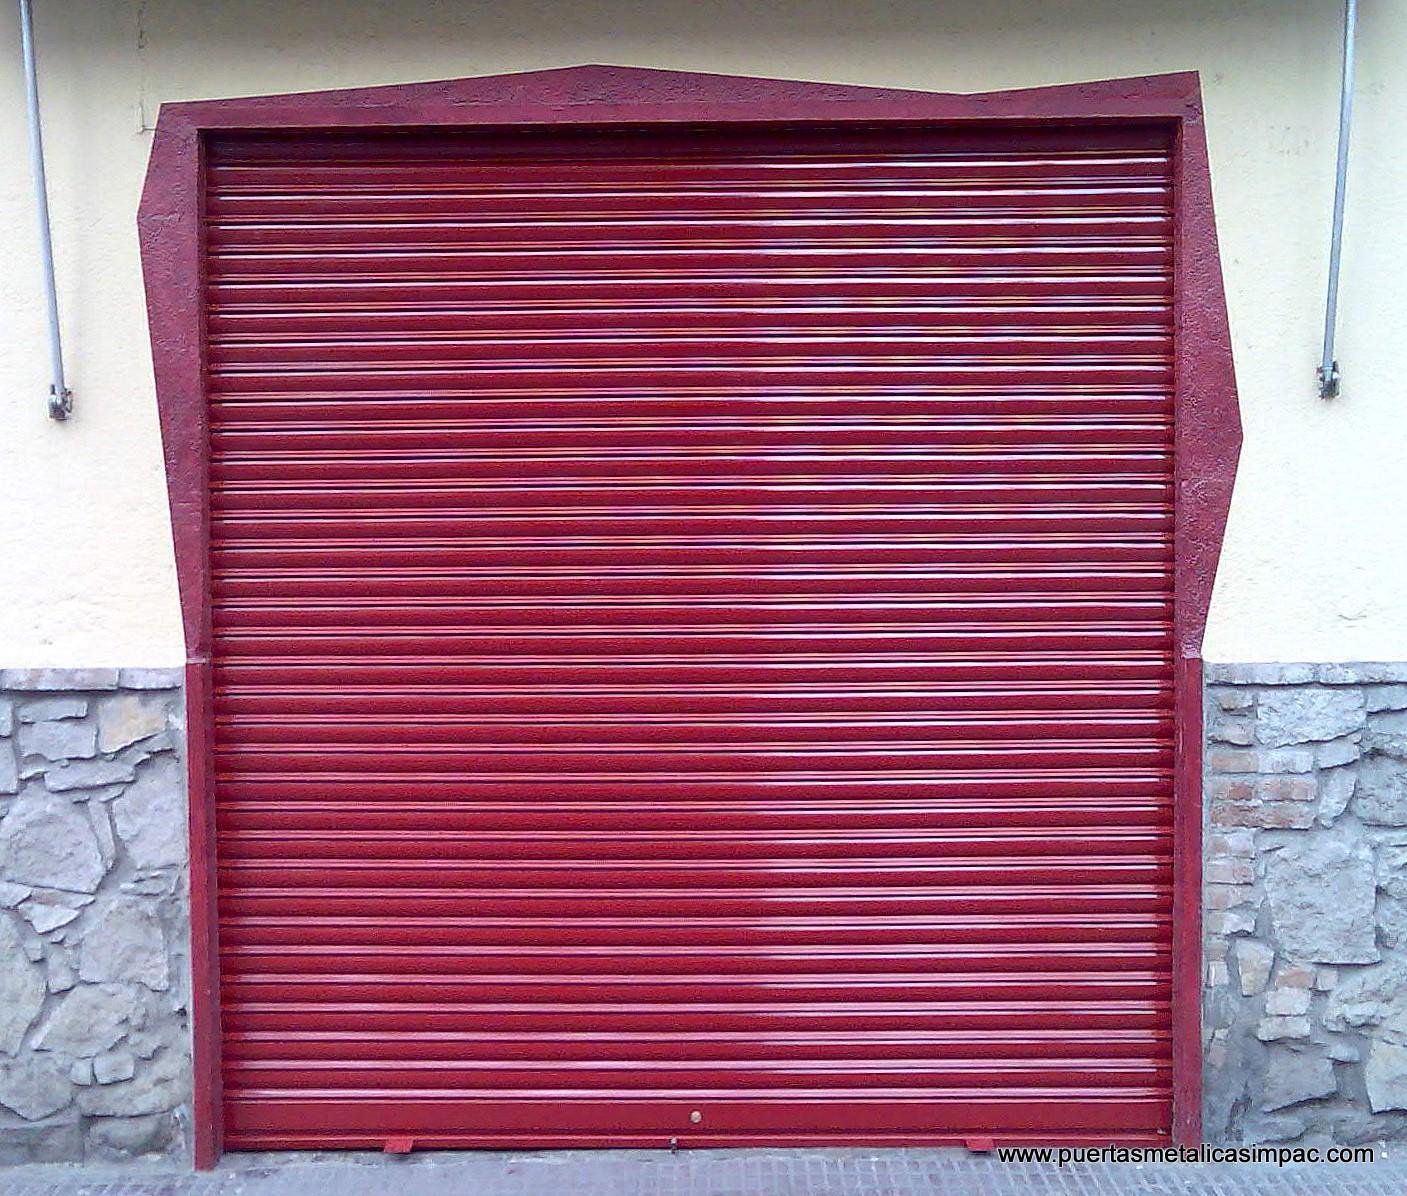 Puertas enrollables impac impac puertas met licas for Puertas metalicas